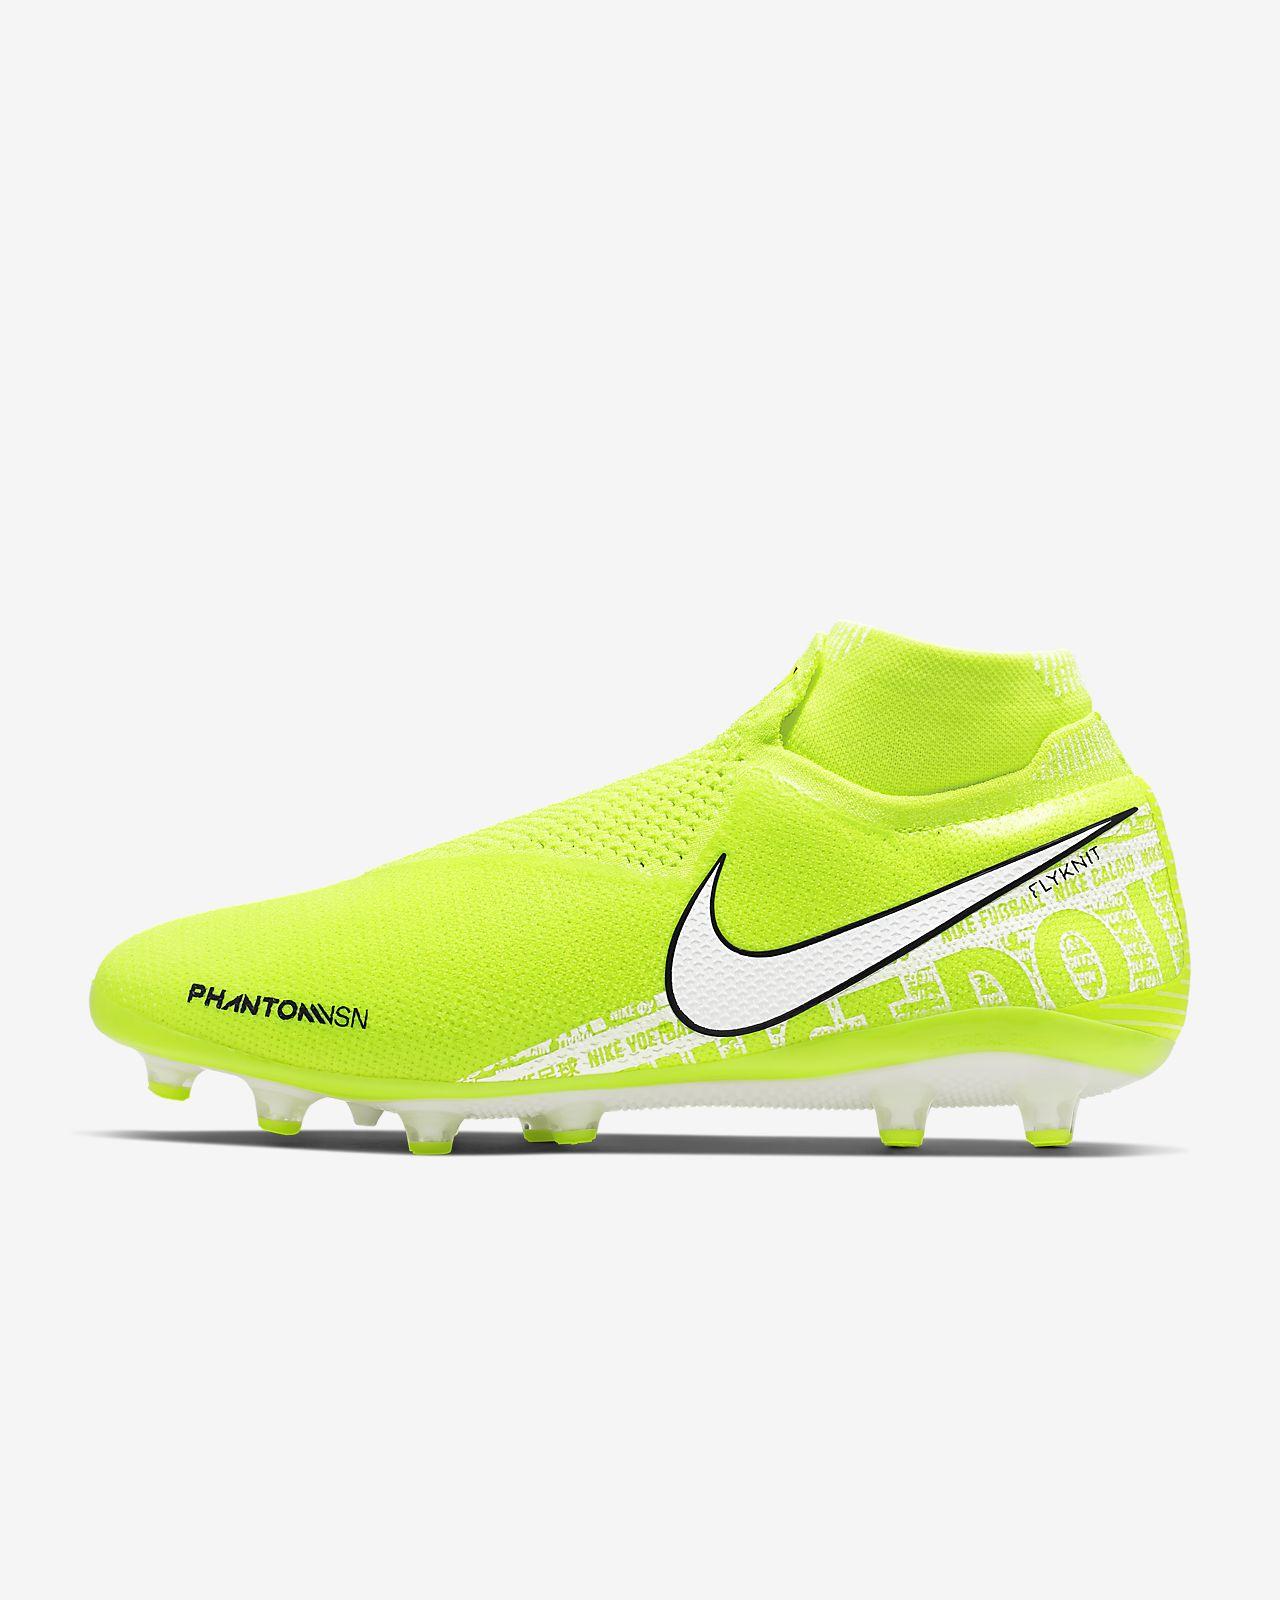 Nike Phantom Vision Elite Dynamic Fit Artificial-Grass Football Boot